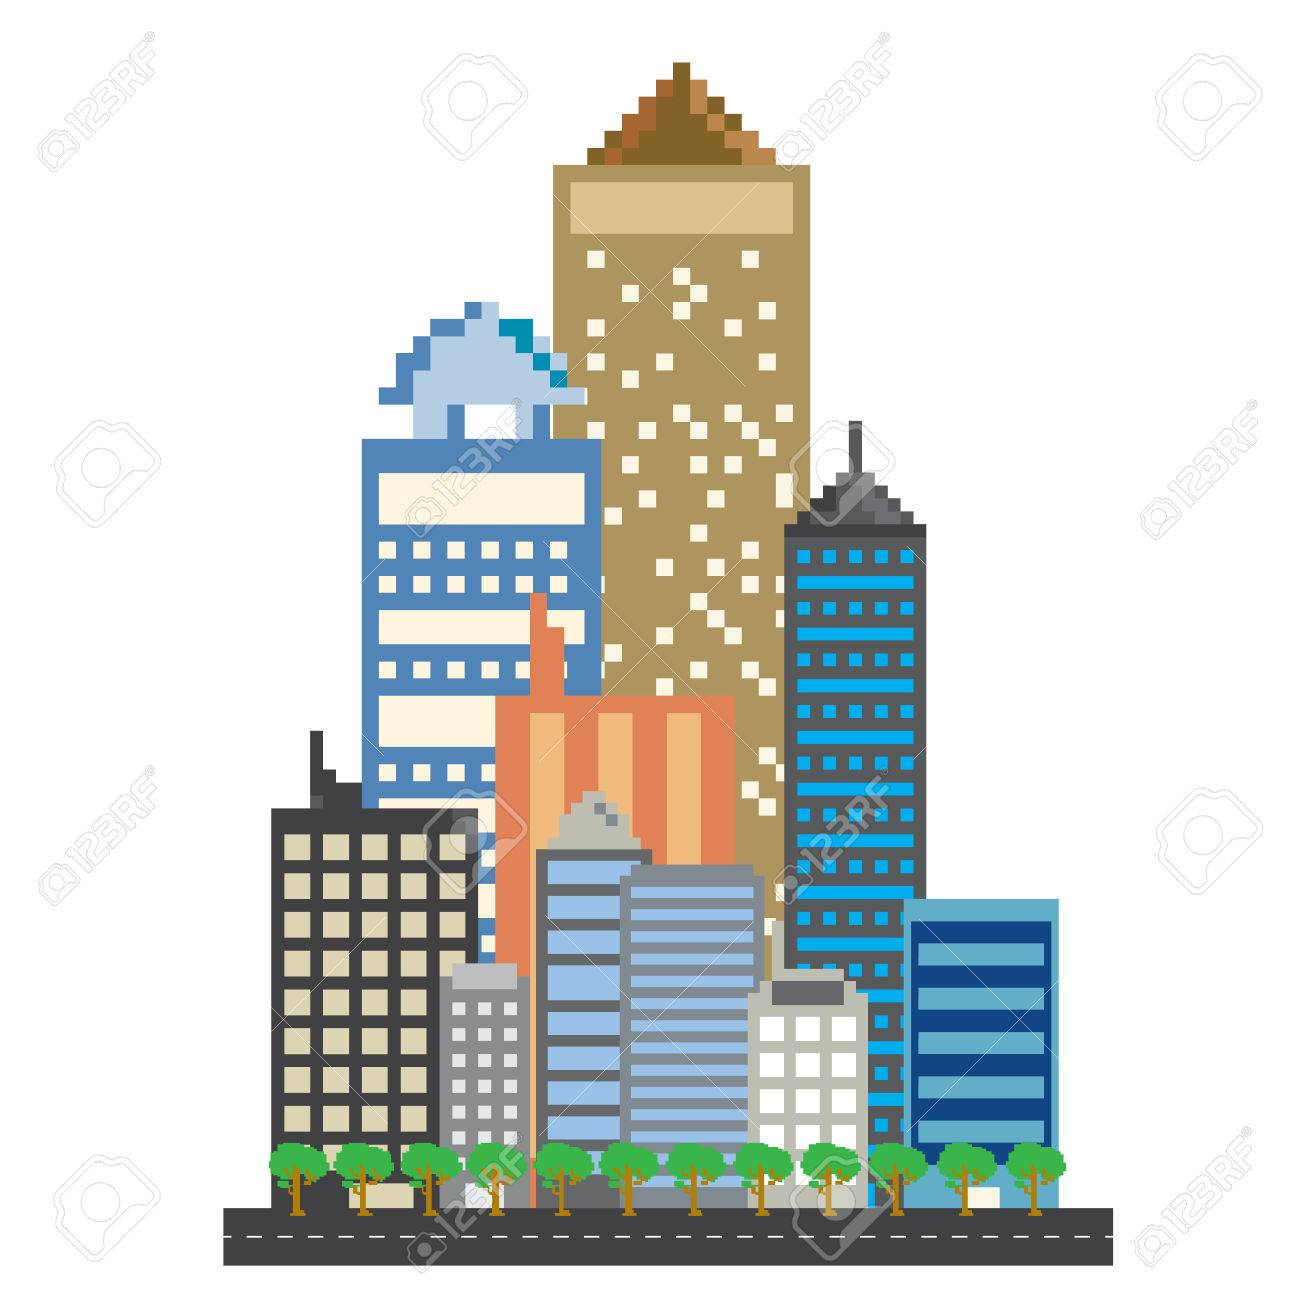 pixel art immeuble